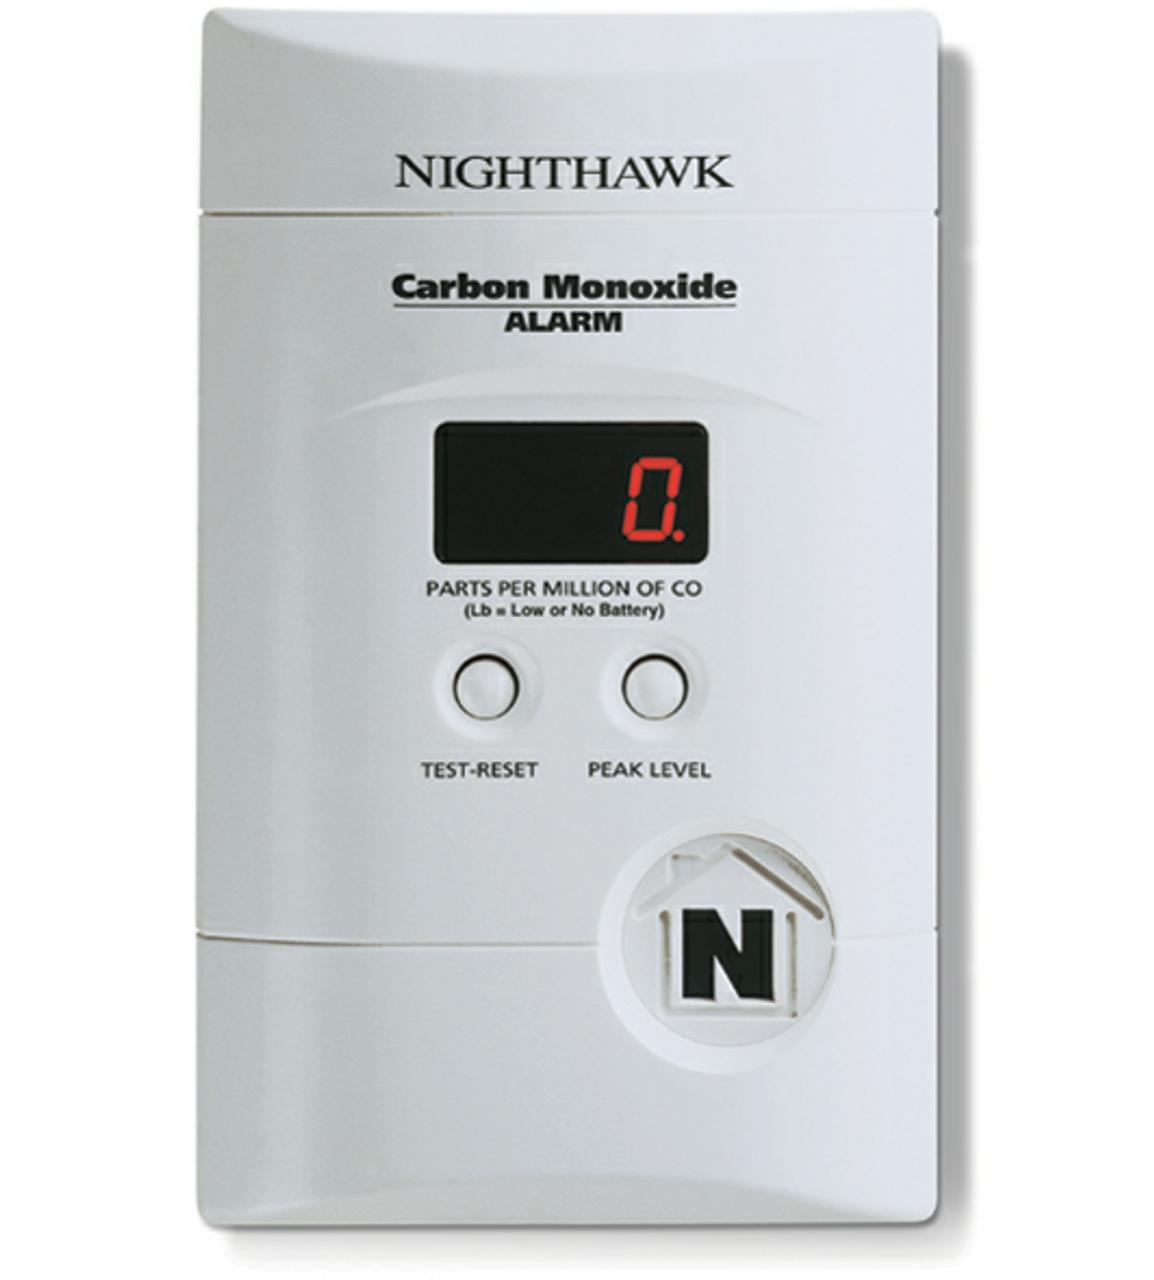 Kidde NHDELUXE - NightHawk™ AC/DC Deluxe CO Alarm